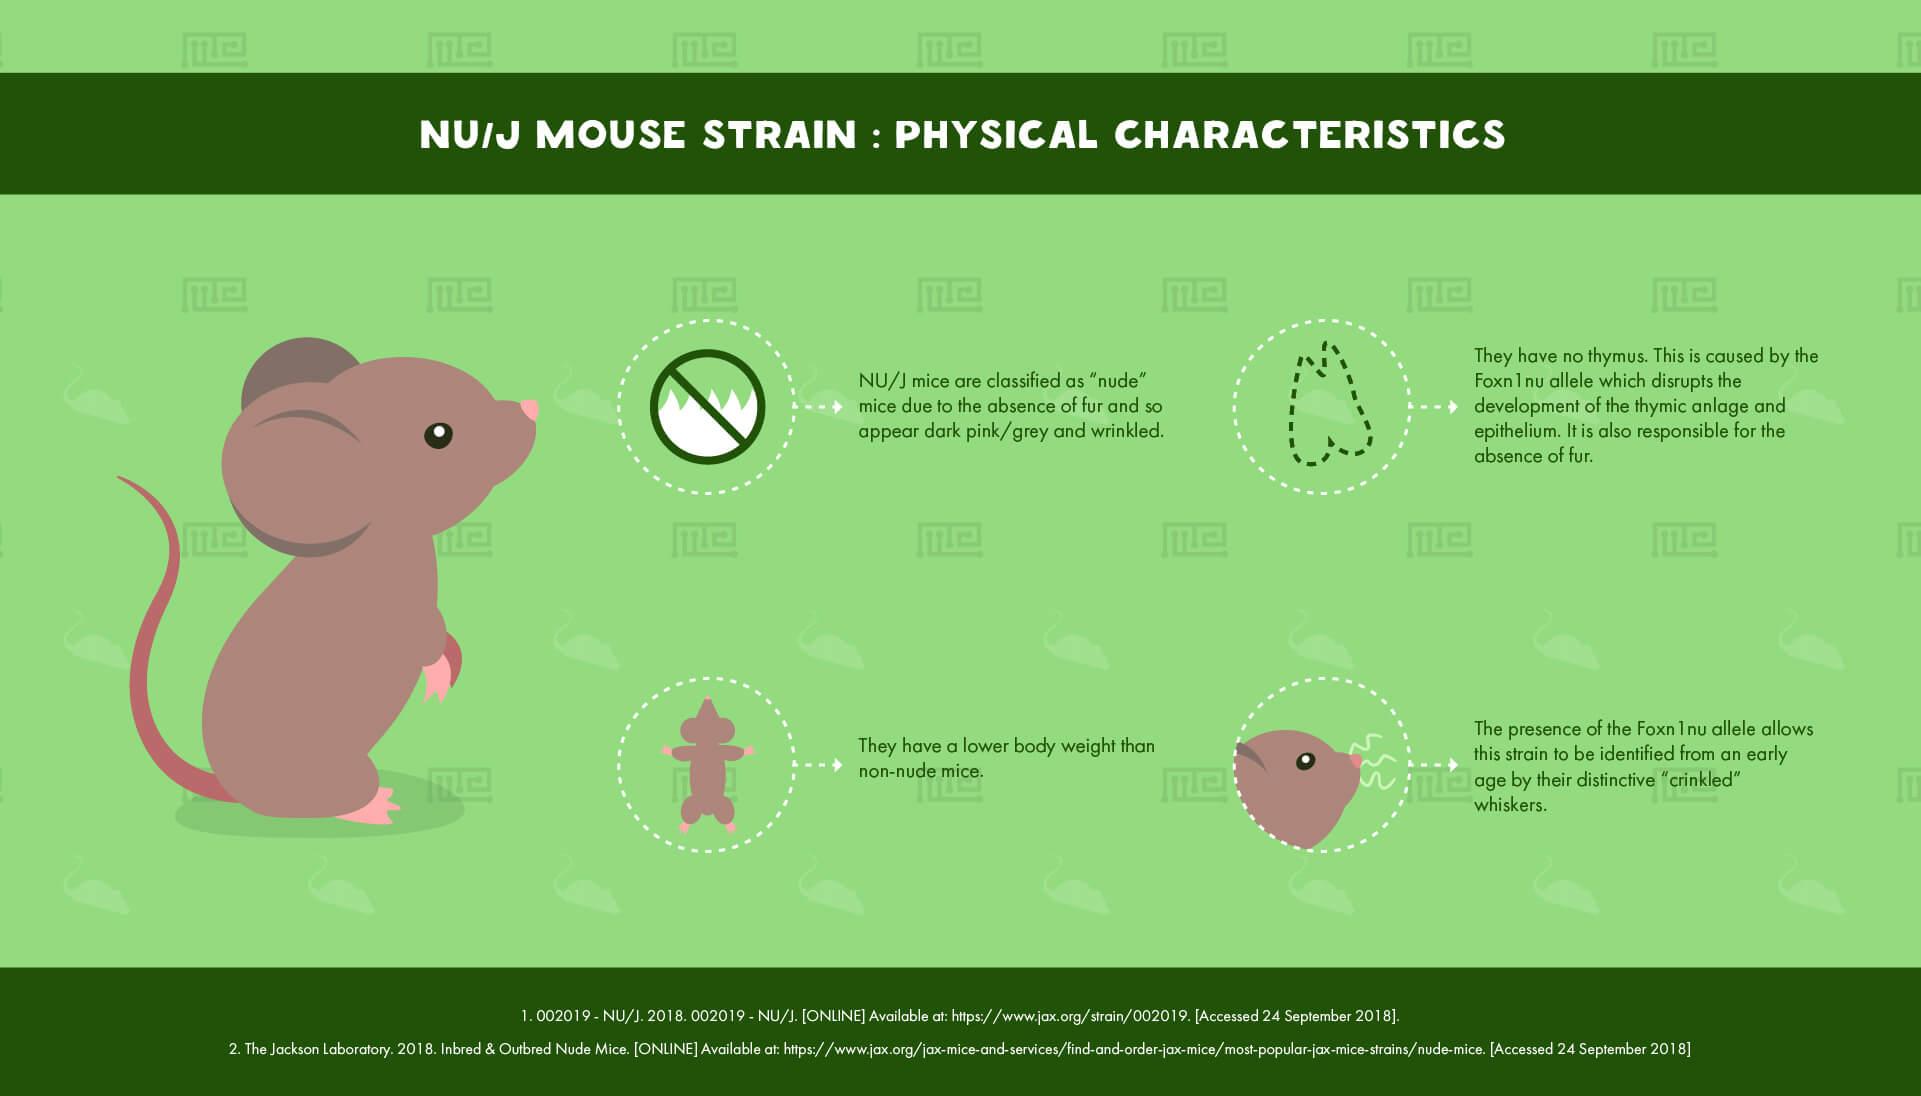 NU J Mouse Strain - Physical Characteristics